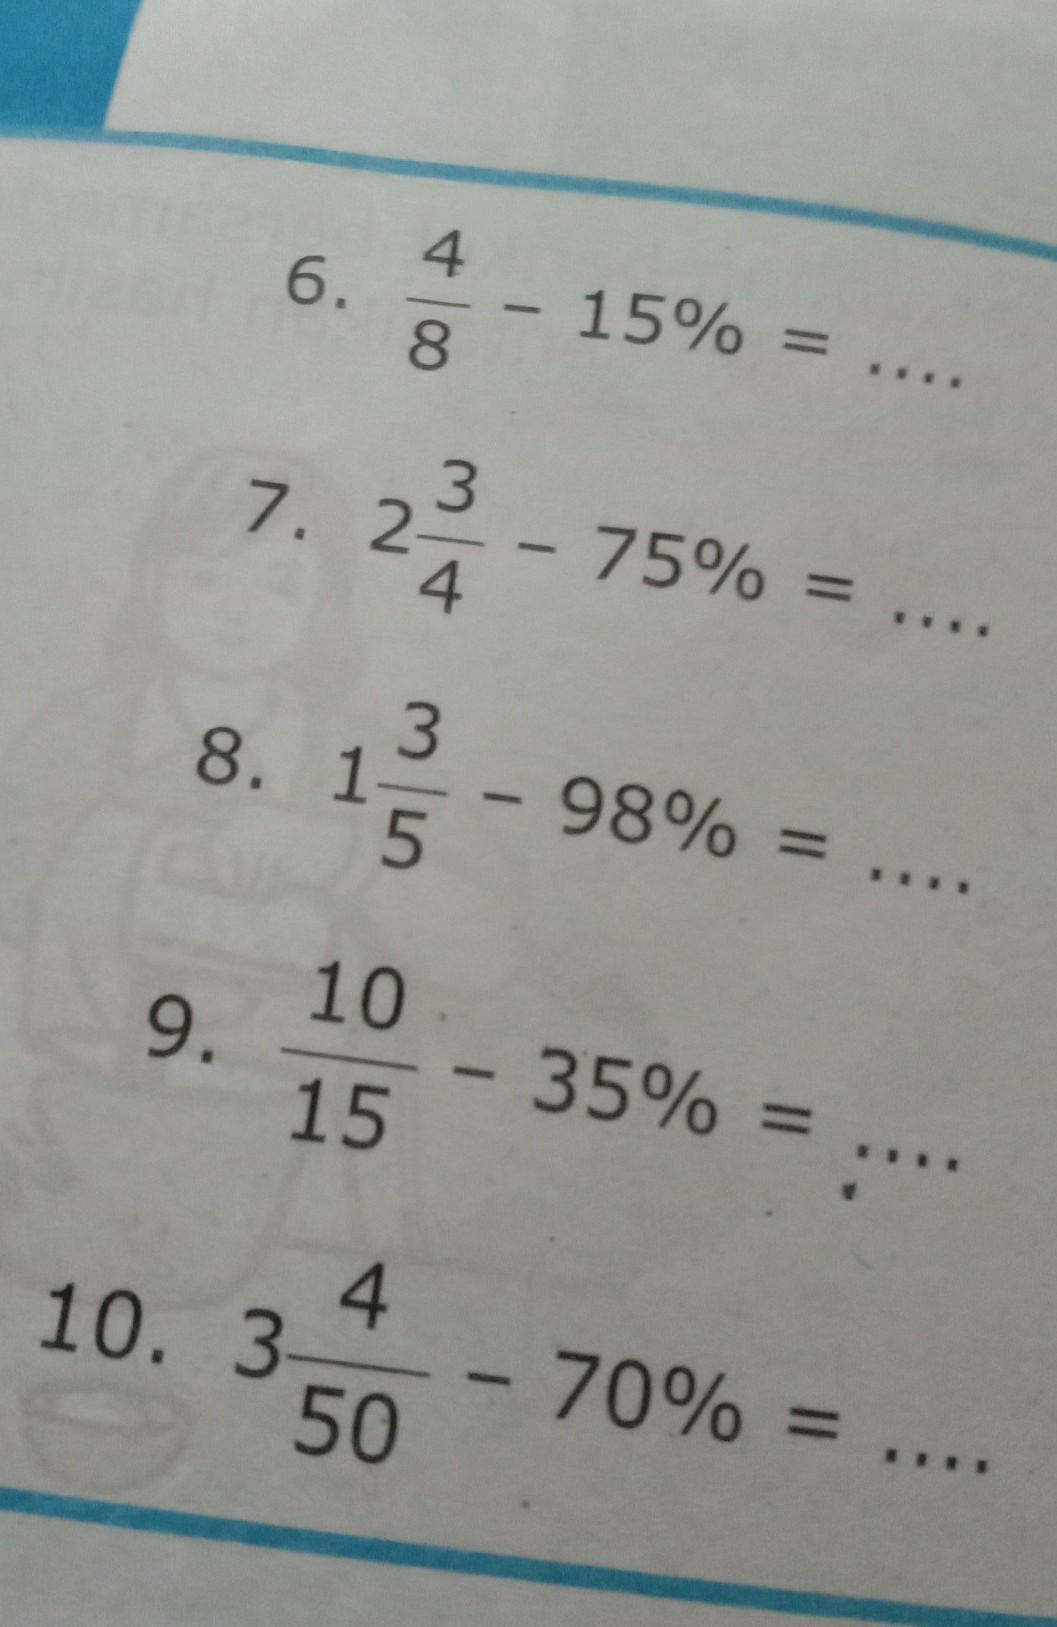 Jawaban Matematika Kls 5 Halaman 22 Brainly Co Id